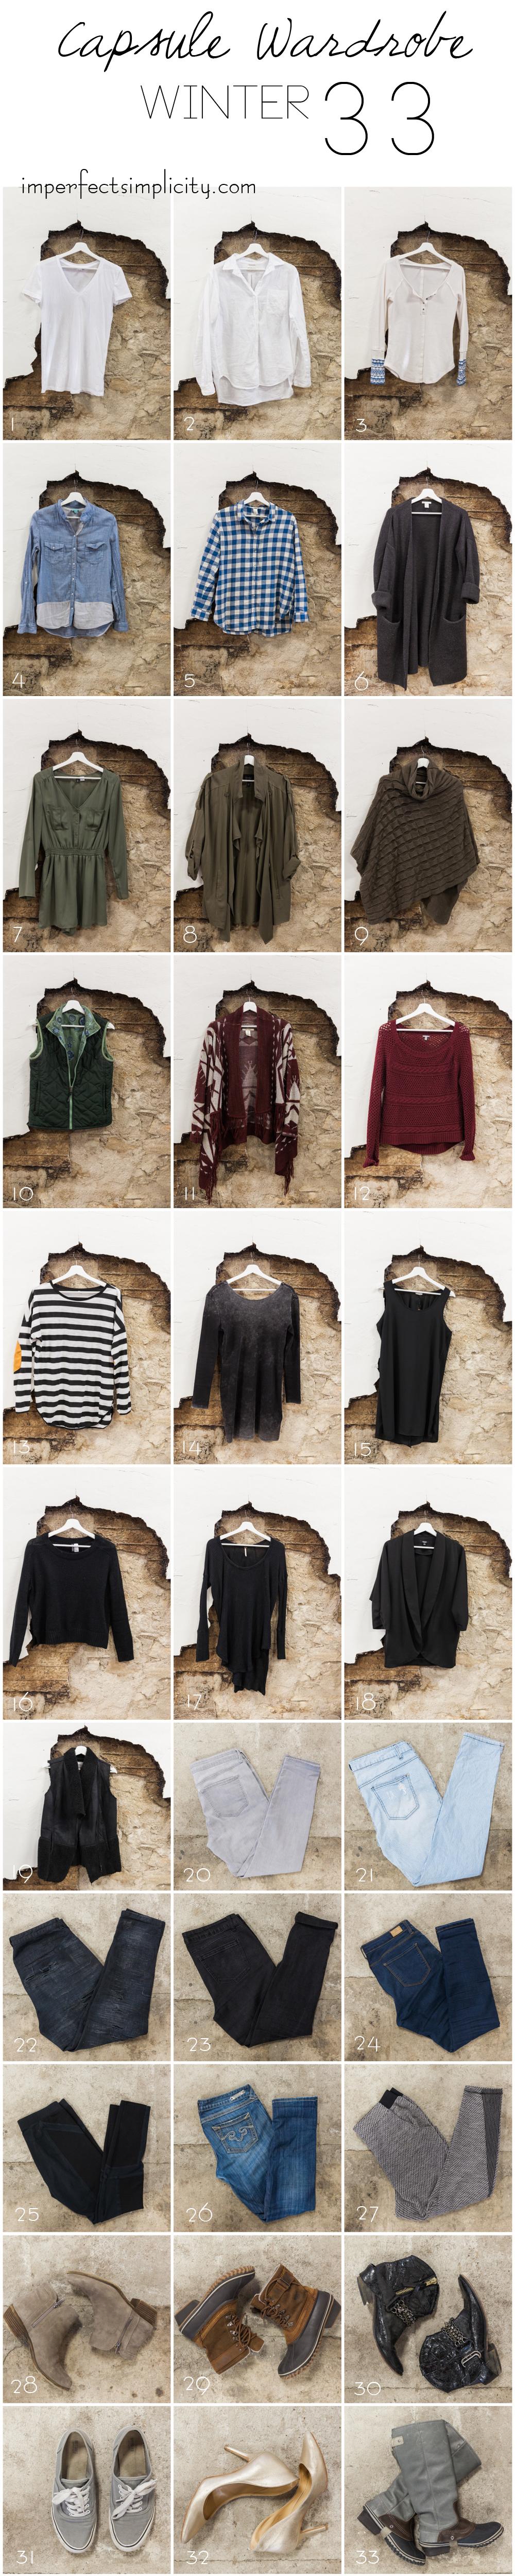 Capsule-Wardrobe-Winter-2016-Imperfect-Simplicity.jpg